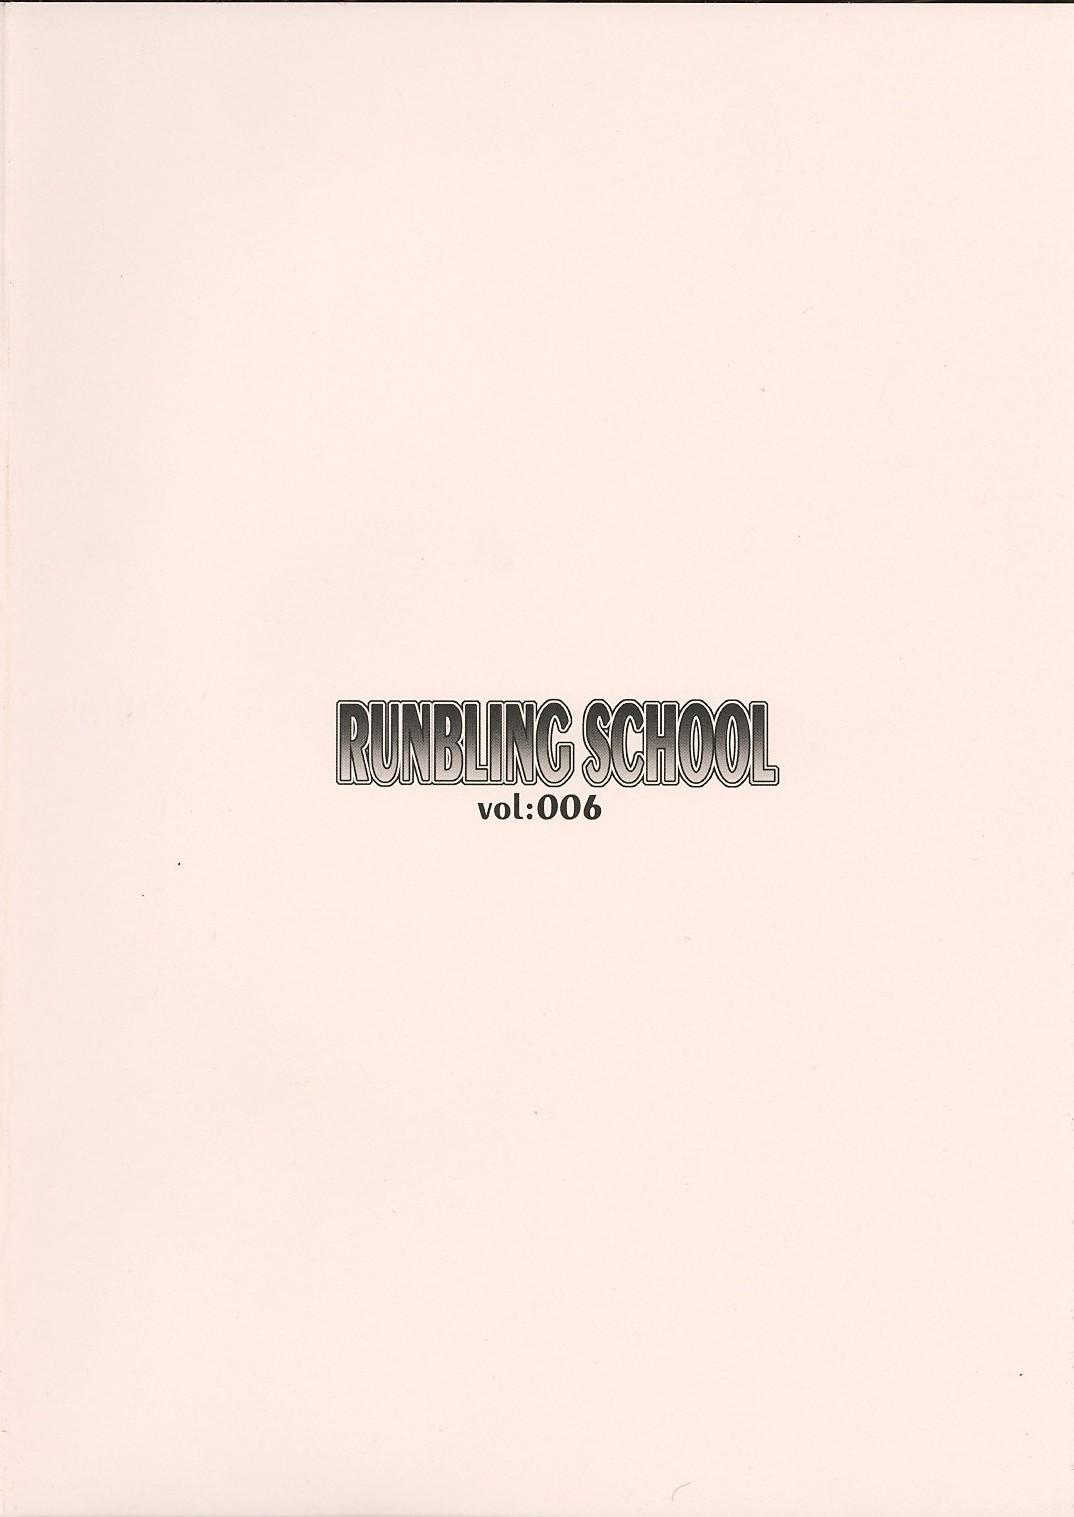 RUNBLING SCHOOL vol: 006 19